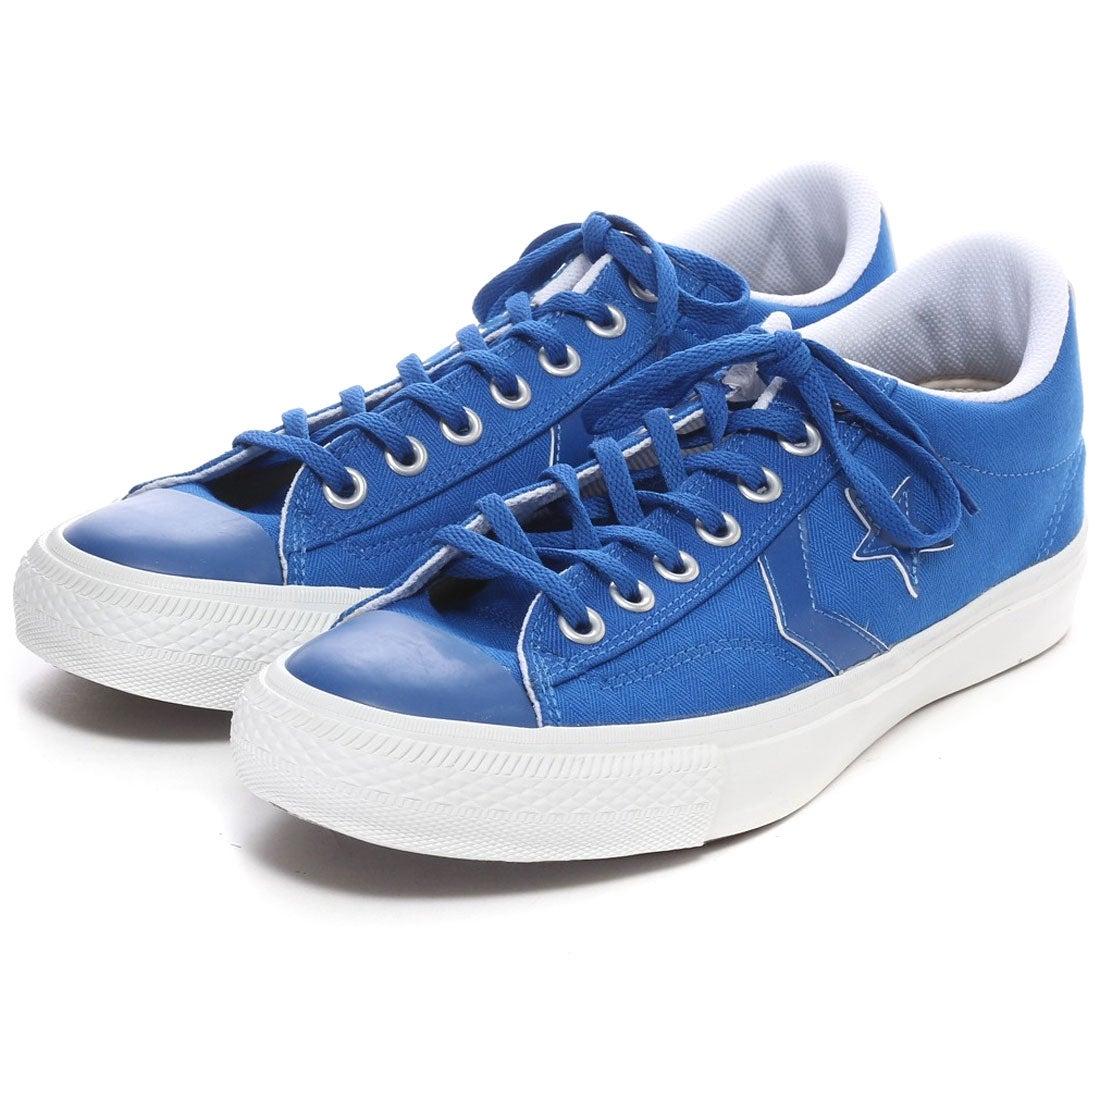 10300a5c4140 コンバース CONVERSE 1CJ692XL CVシェブロンスター HB OX(ブルー) -靴&ファッション通販 ロコンド〜自宅で試着、気軽に返品